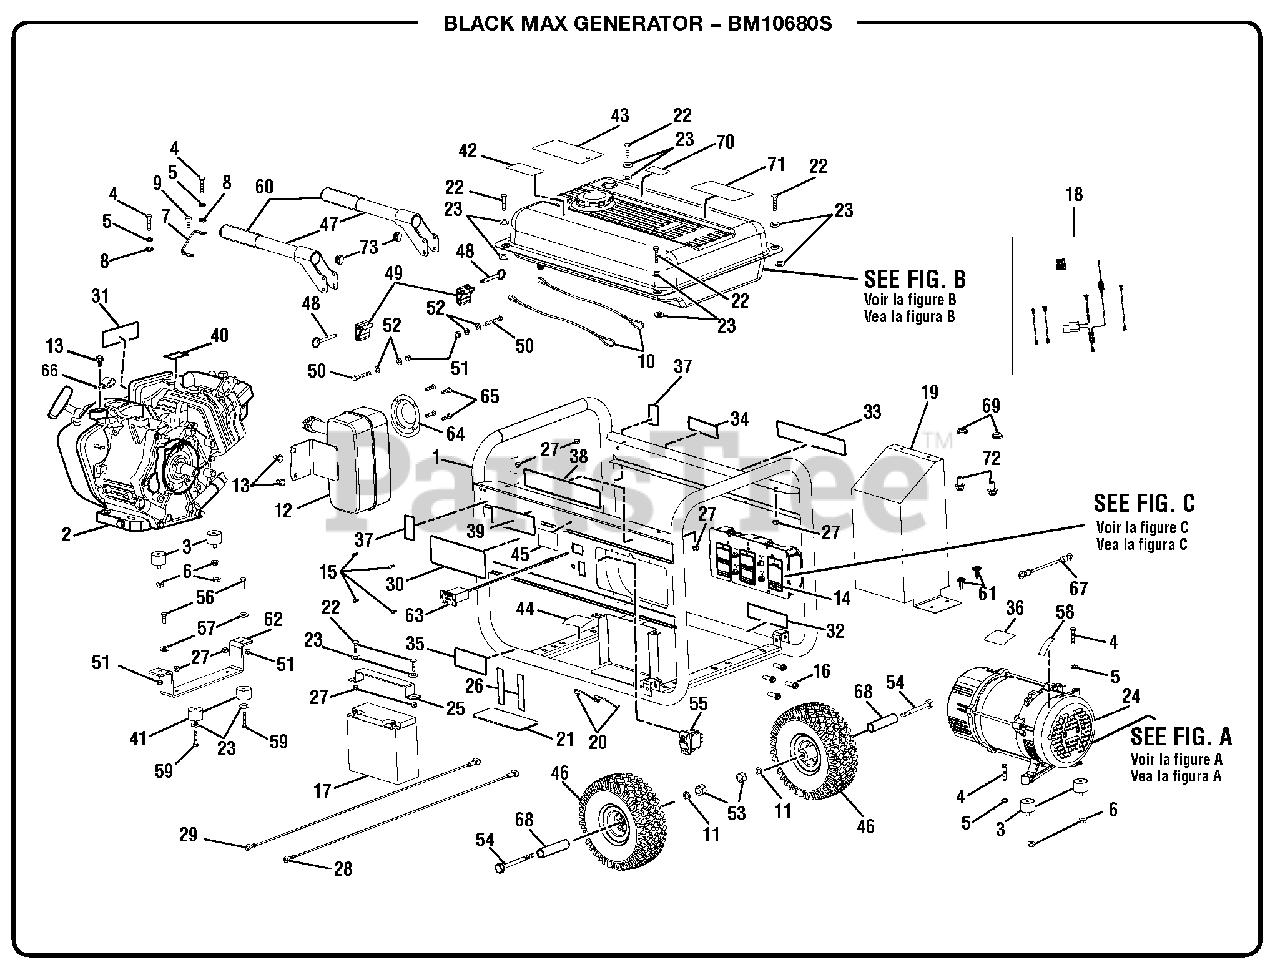 Yamaha Mz360 Engine Wiring Diagram - Avalon Wiring Harness  bege-doe1.au-delice-limousin.fr | Mz360 Wiring Diagram |  | Bege Wiring Diagram - Bege Wiring Diagram Full Edition